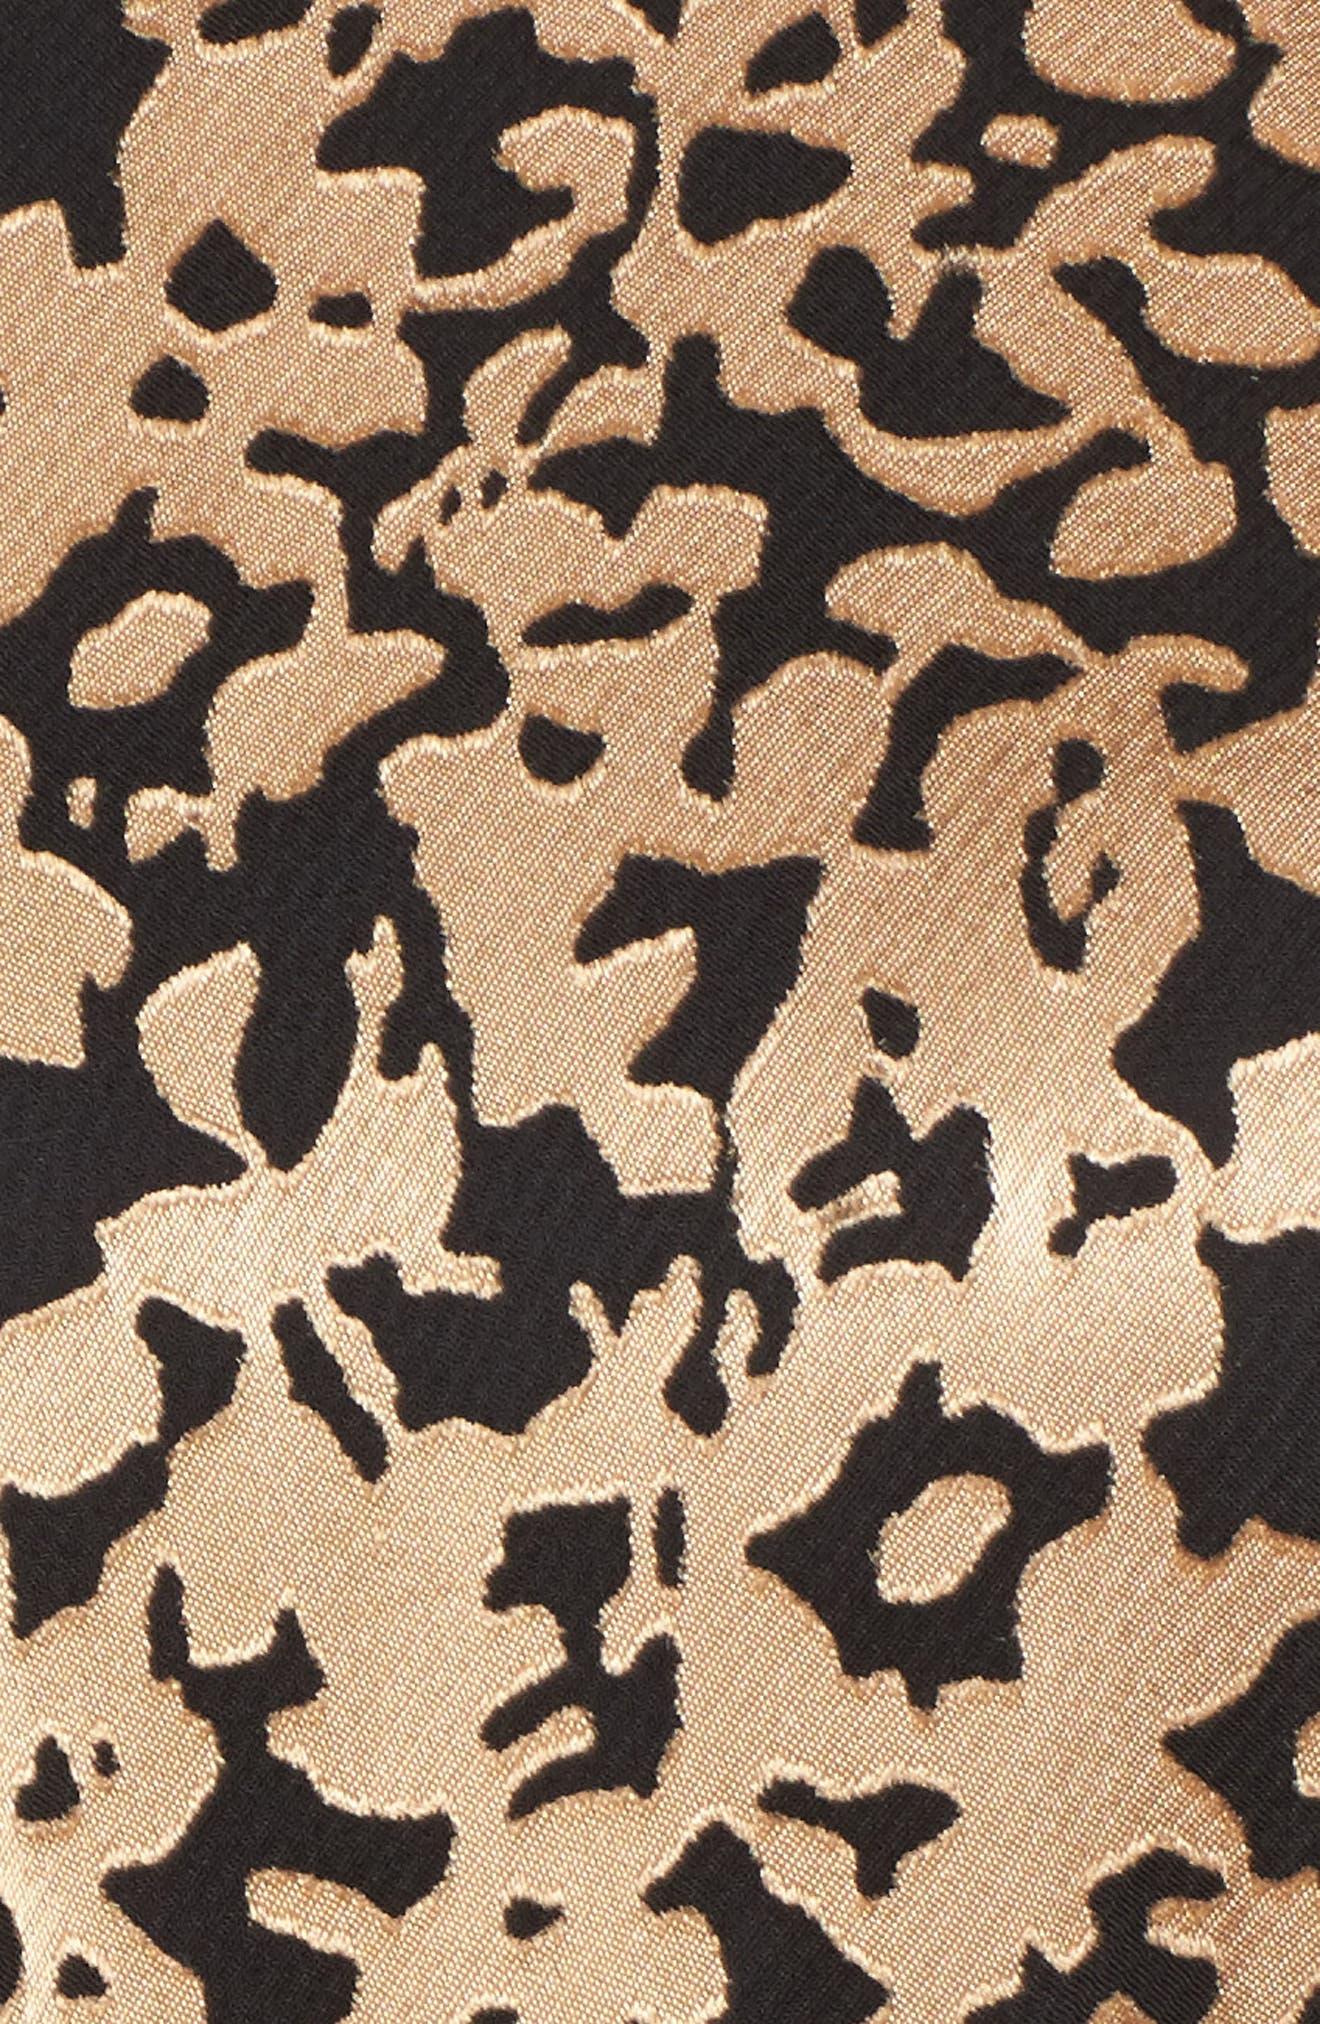 Kells Metallic Fit & Flare Dress,                             Alternate thumbnail 5, color,                             Gold/ Black